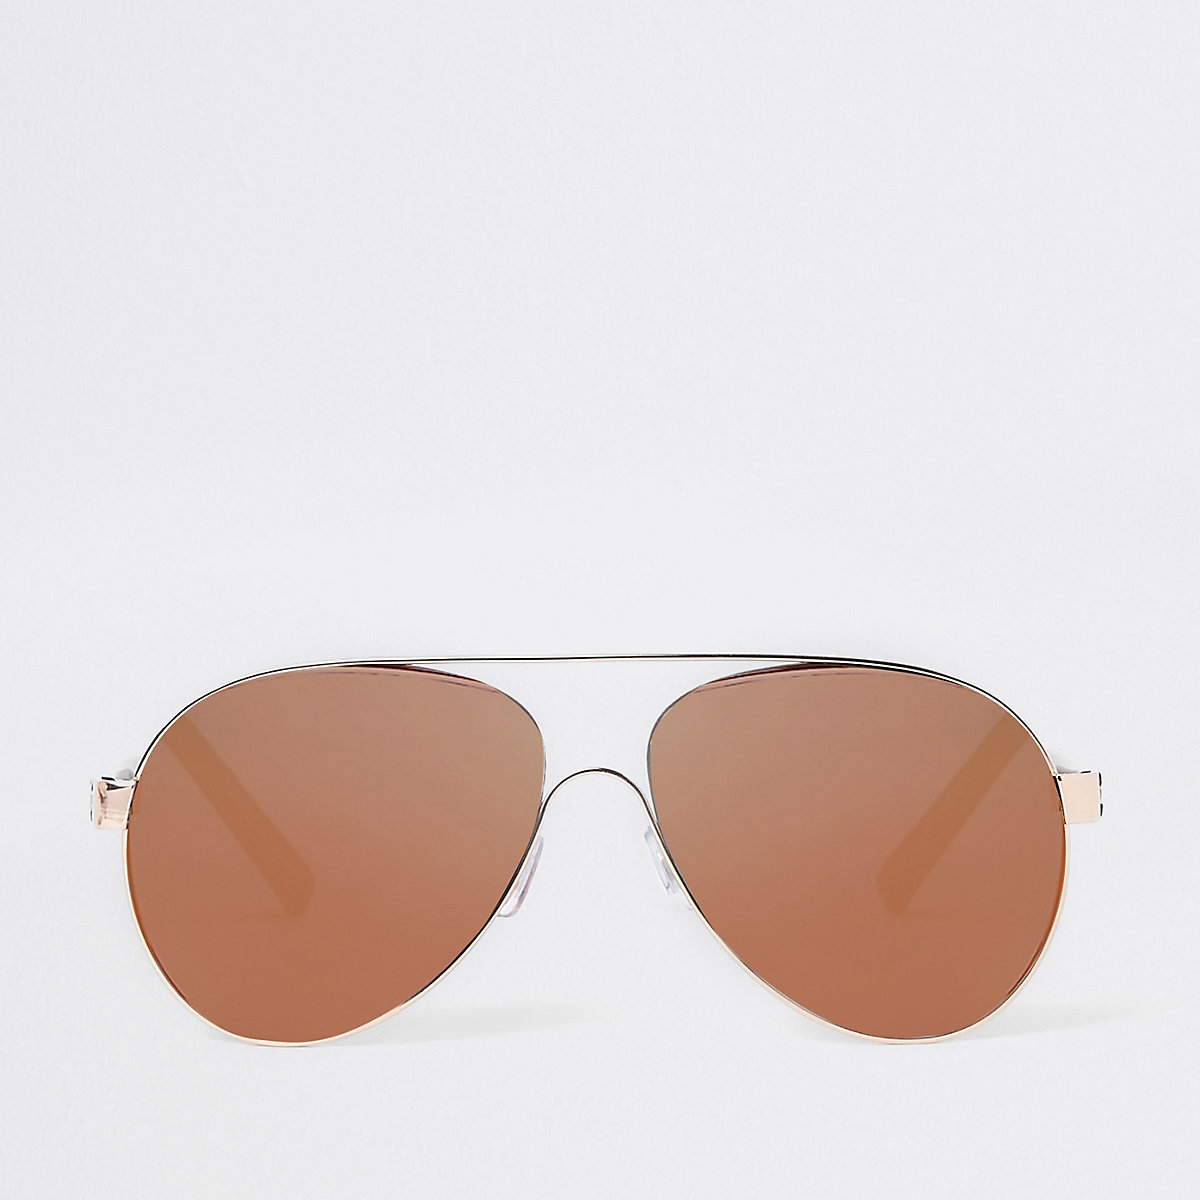 Rose gold brown lens aviator sunglasses